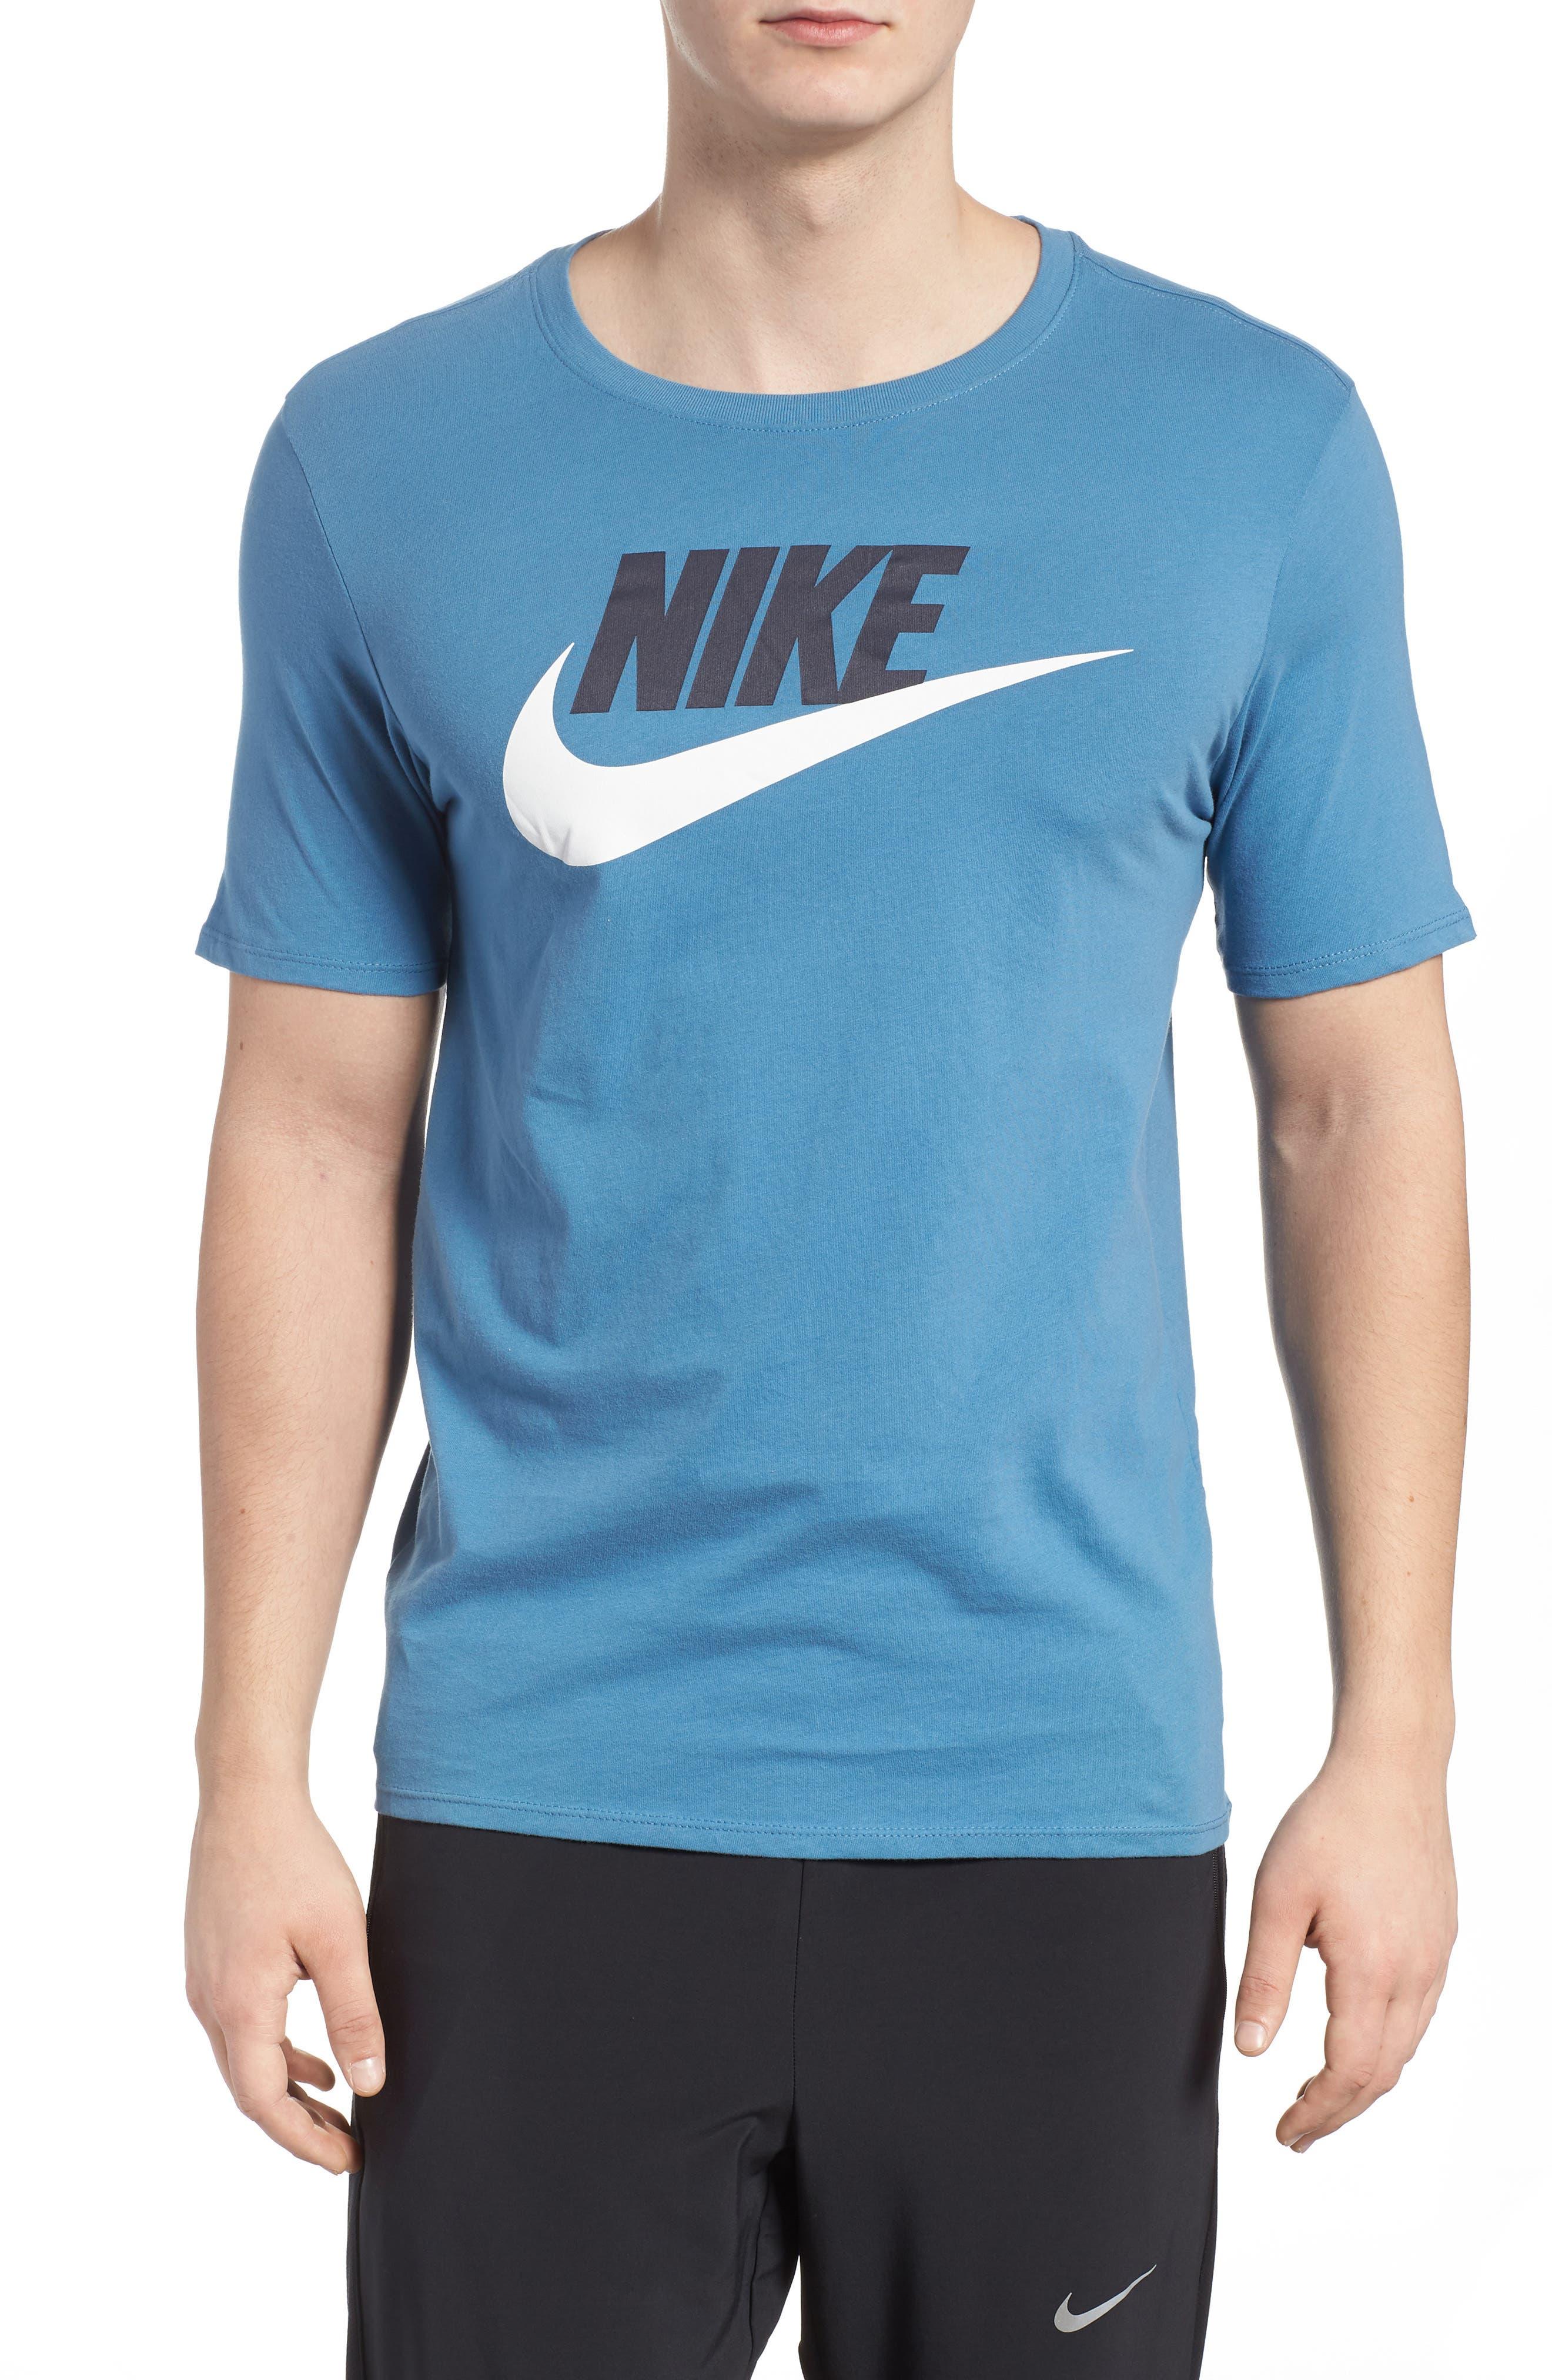 Nike 'Tee-Futura Icon' Graphic T-Shirt